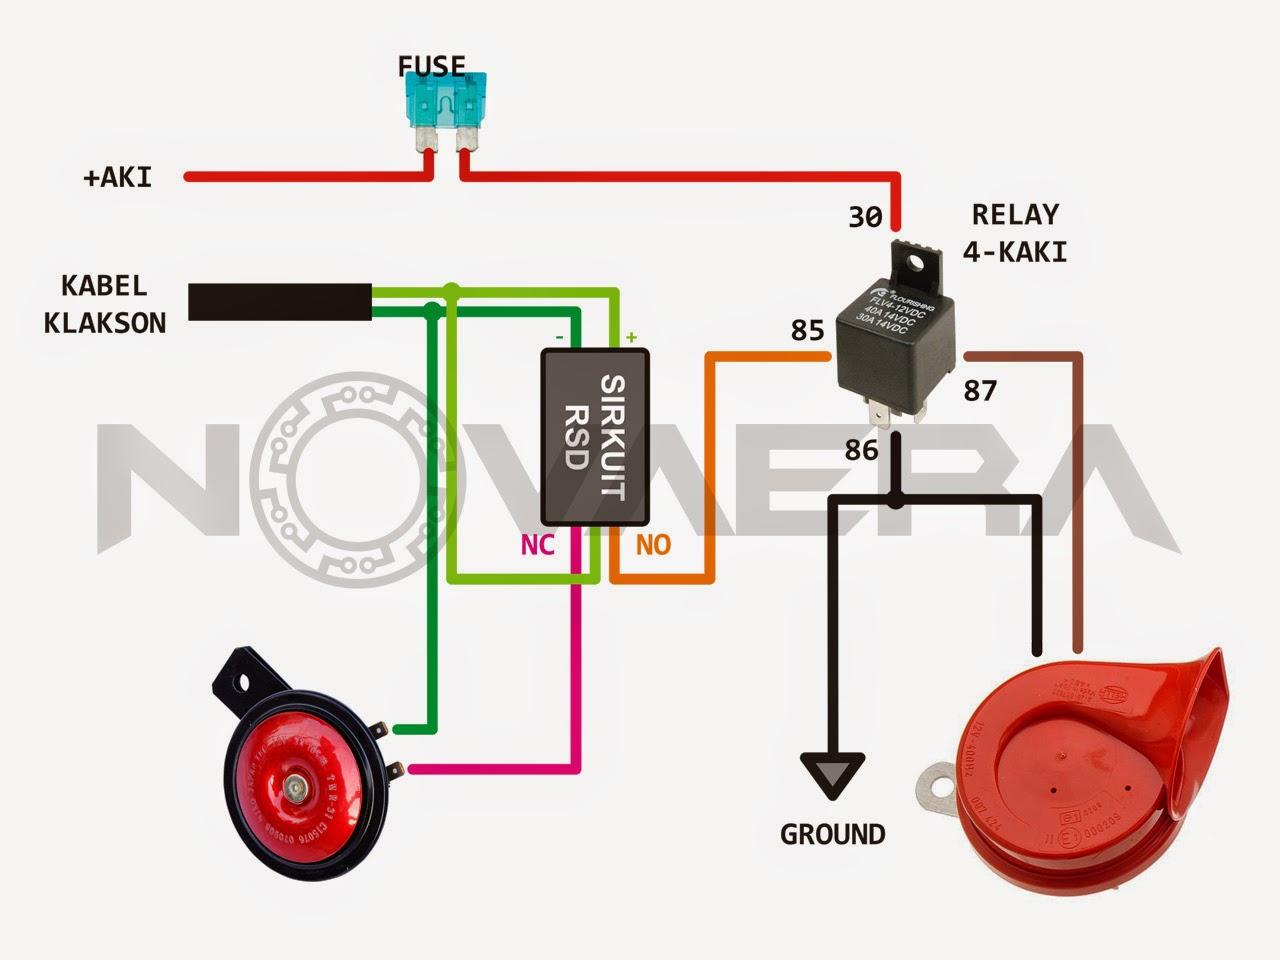 rangkaian klakson dengan relay | Seputar Info Tentang Otomotif